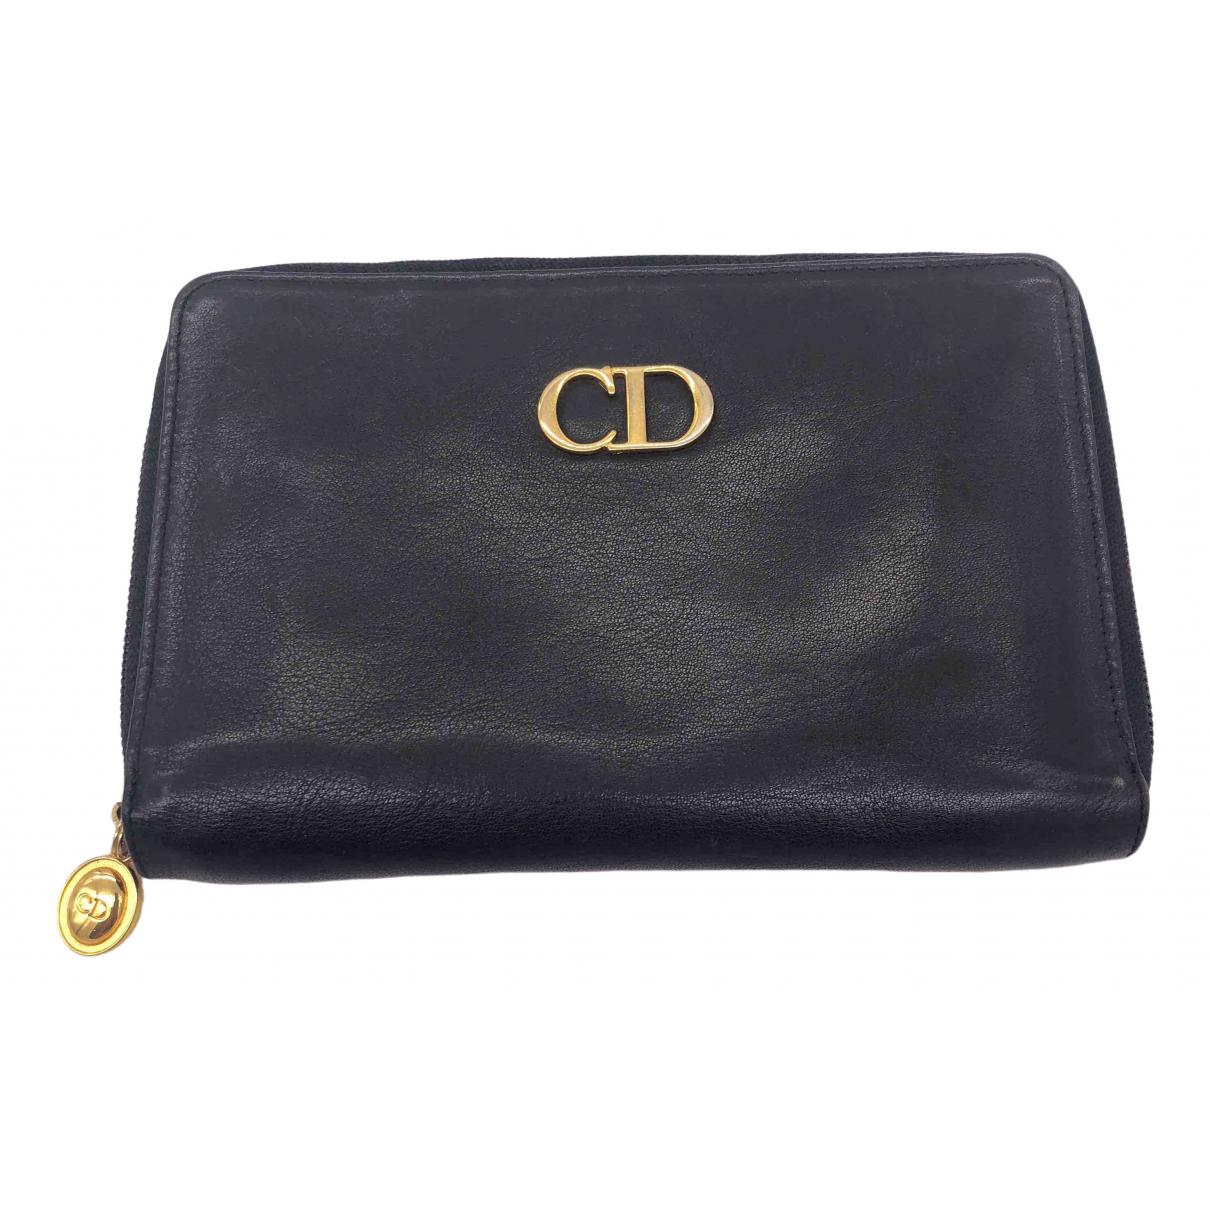 Christian Dior \N Kleinlederwaren in  Schwarz Leder